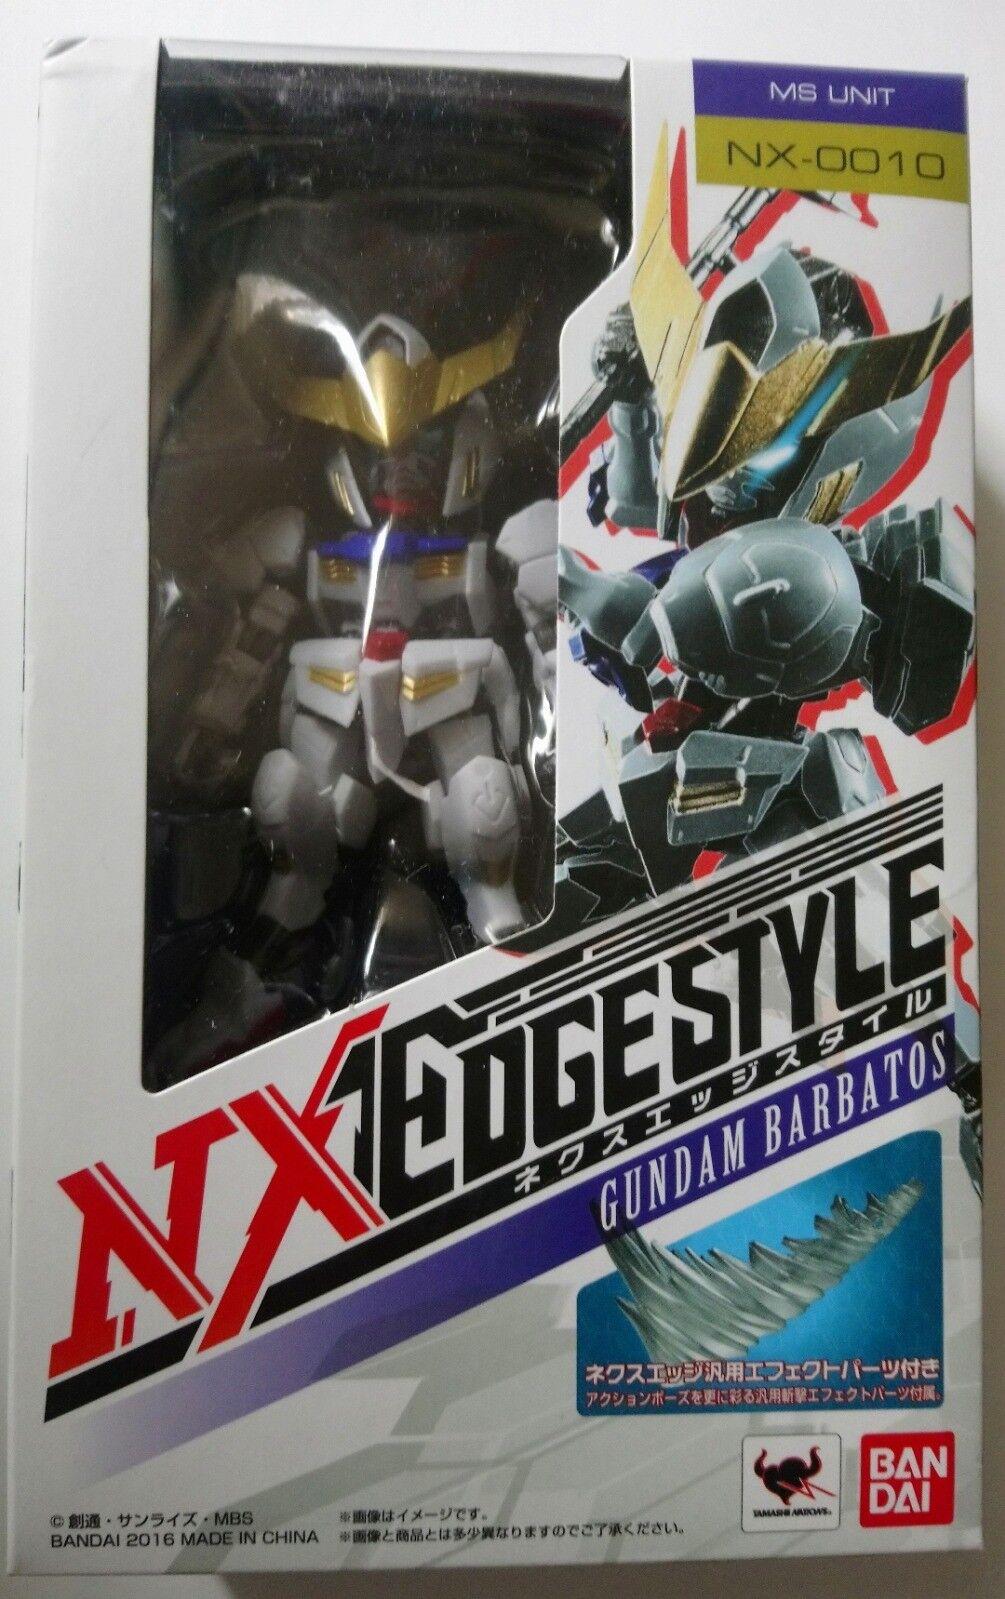 NX Edge Style [Gundam Barbatos] NX-0010 Japan Import Action Figure NEW